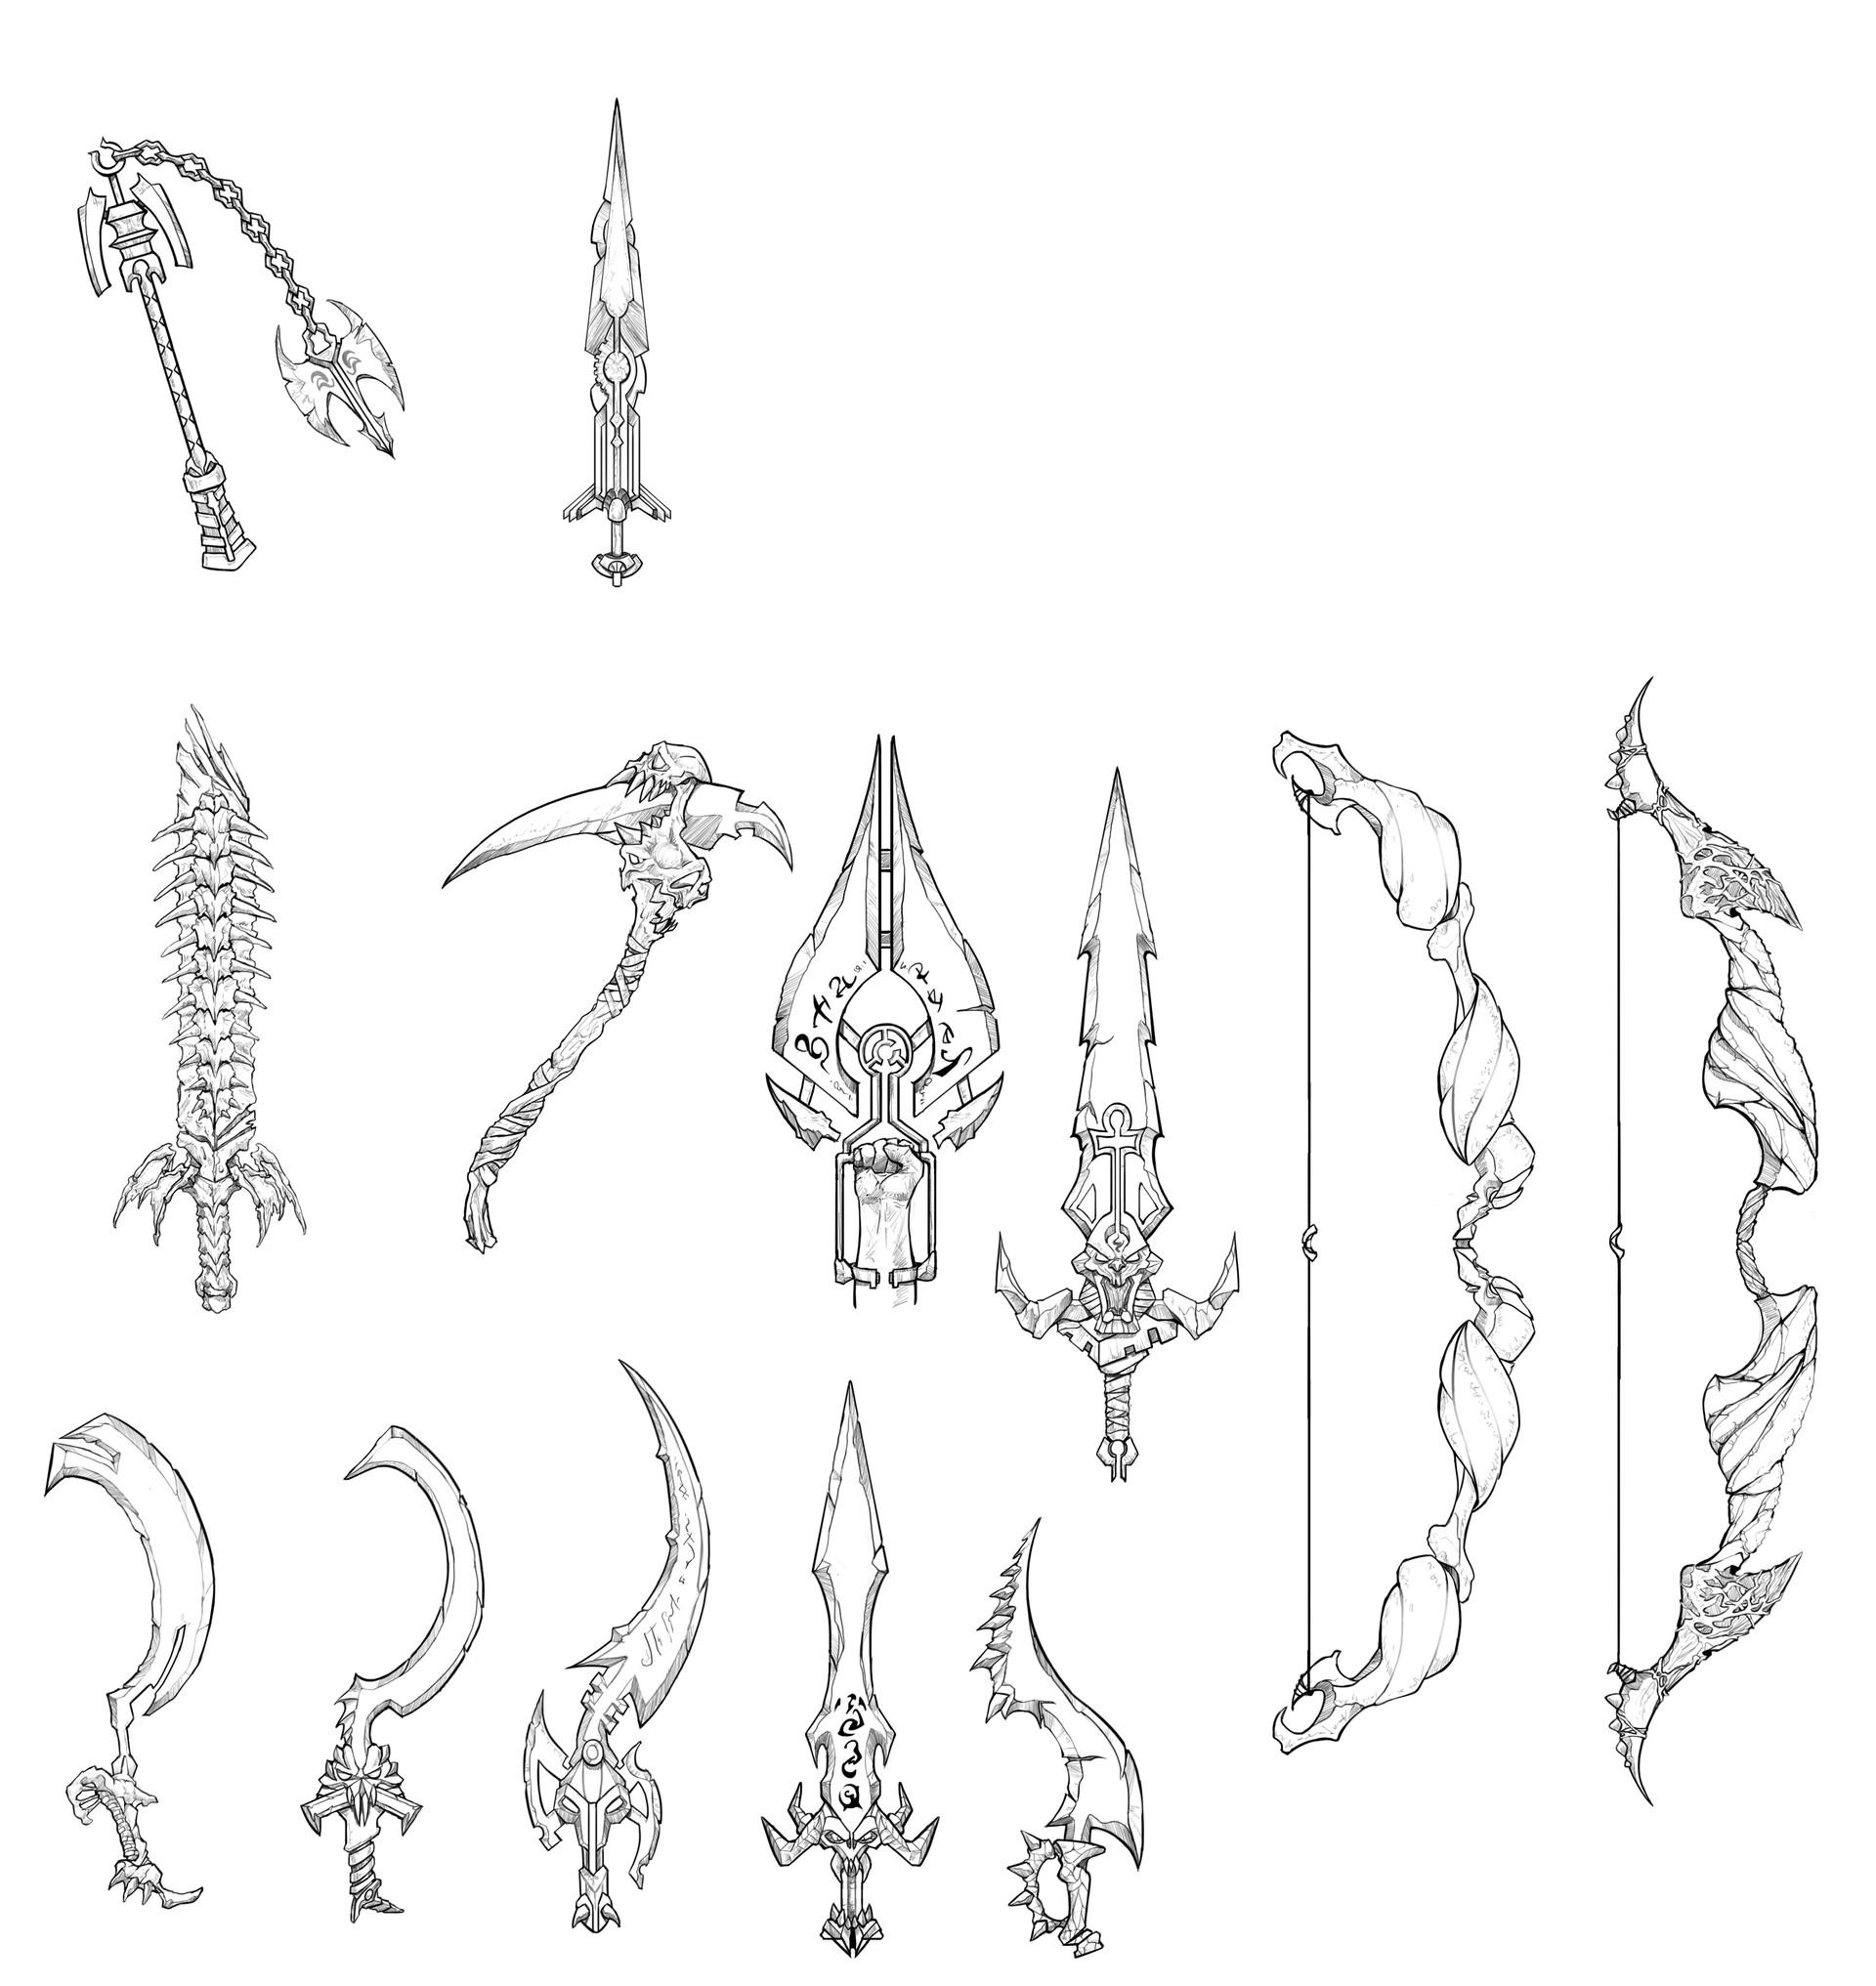 Peter rocque weapons sketch